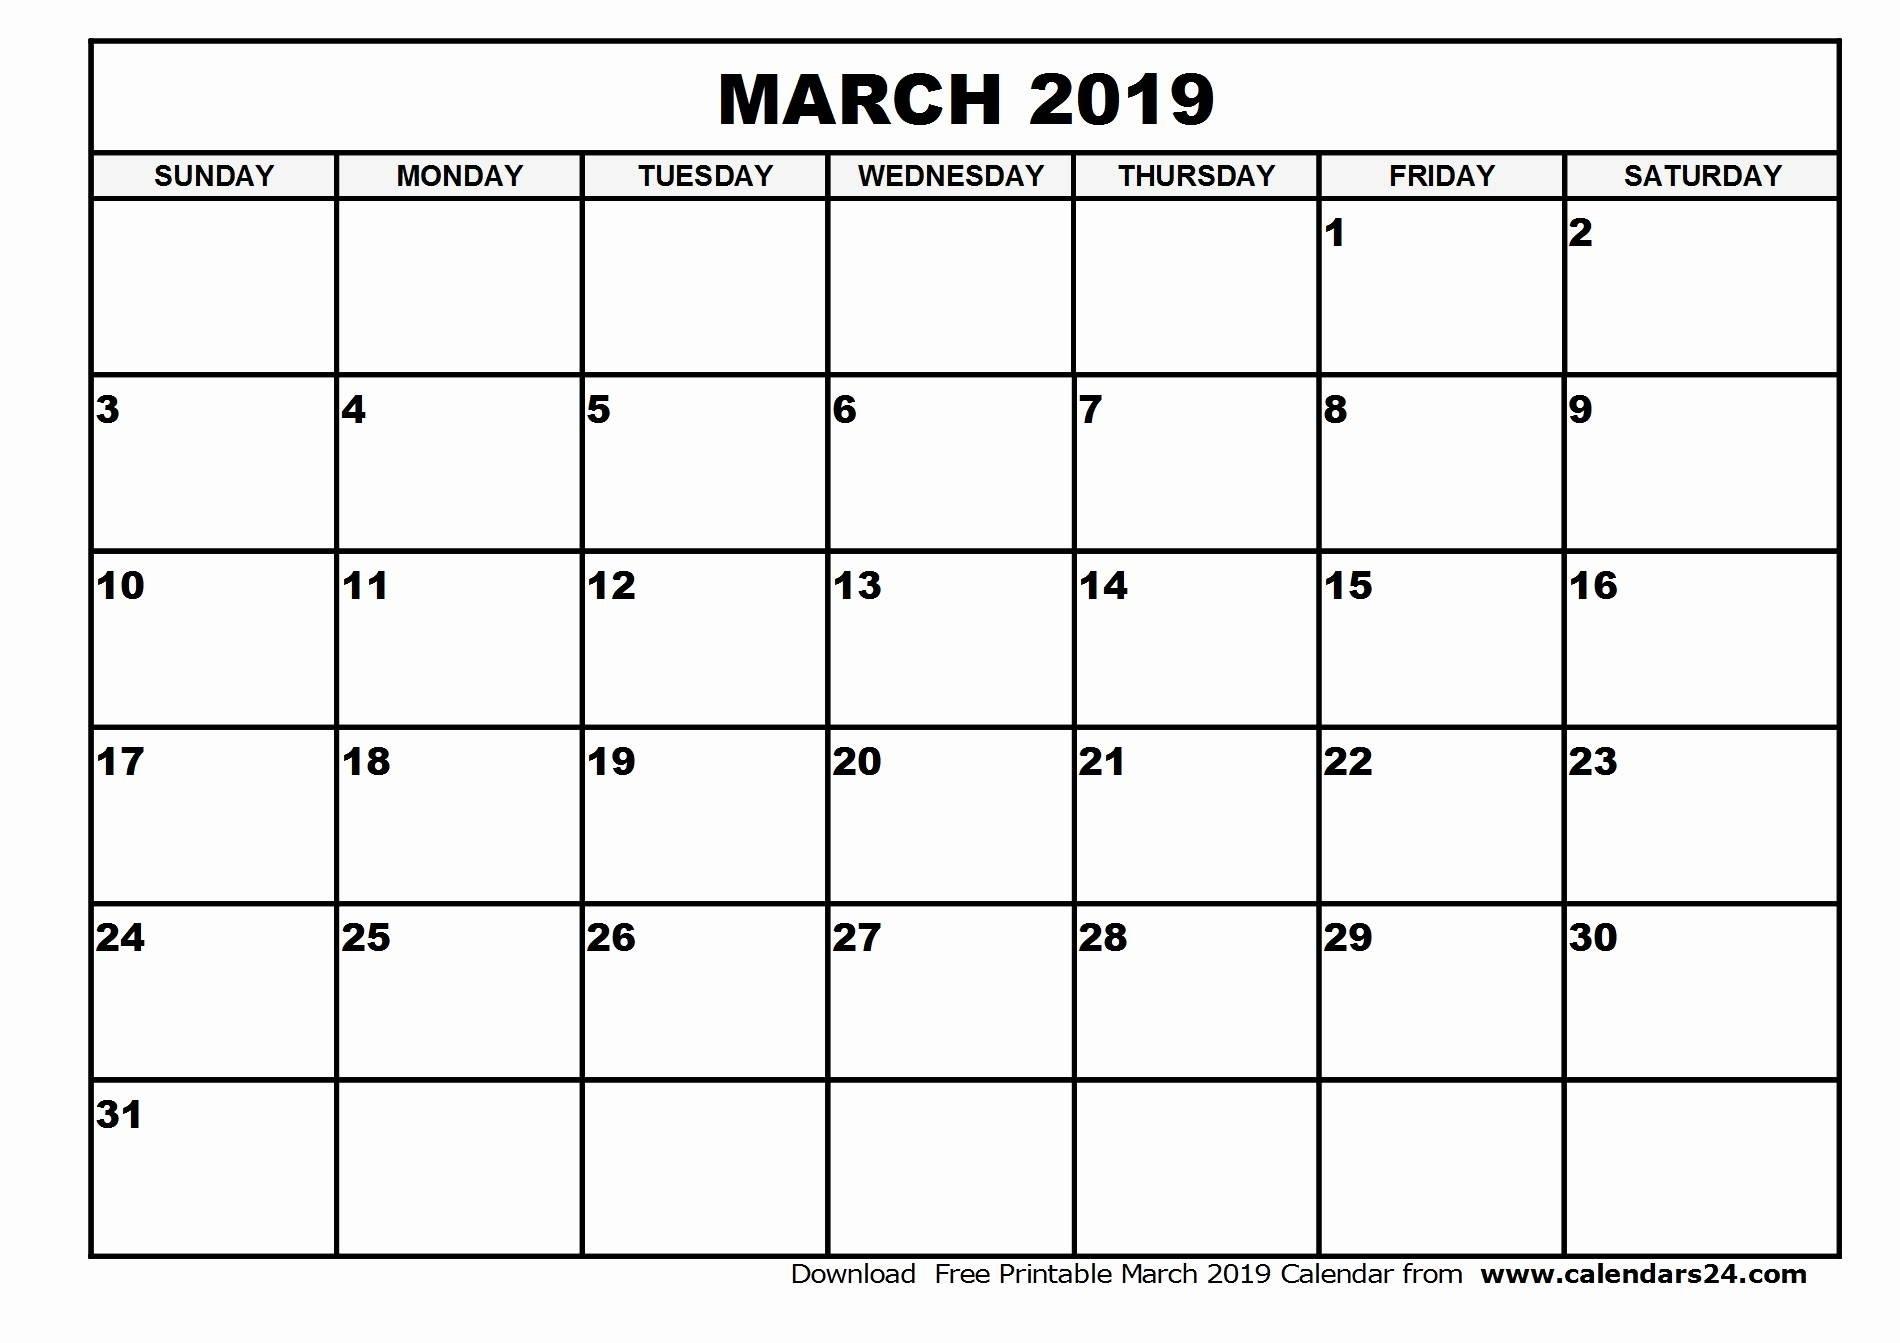 Blank March 2019 Calendar Templates Printable Download - July 2019 for Blank Monthly Calendar To Download Free